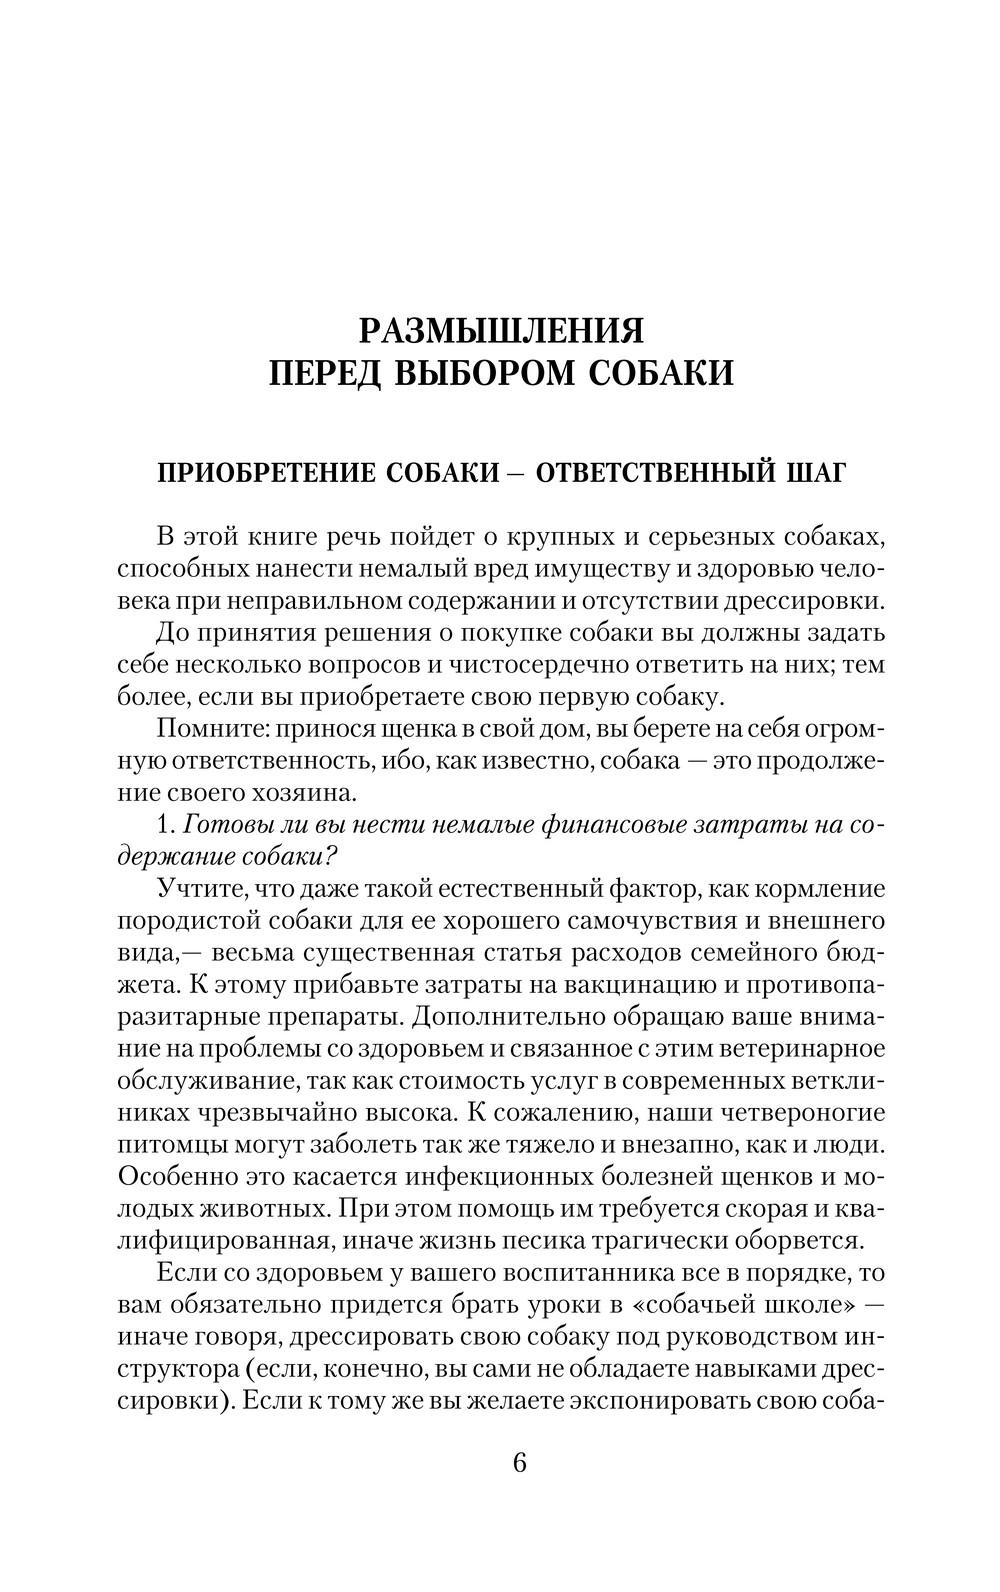 http://i5.imageban.ru/out/2014/01/12/8cfb3a5704c38135091331fe7aeefd91.jpg